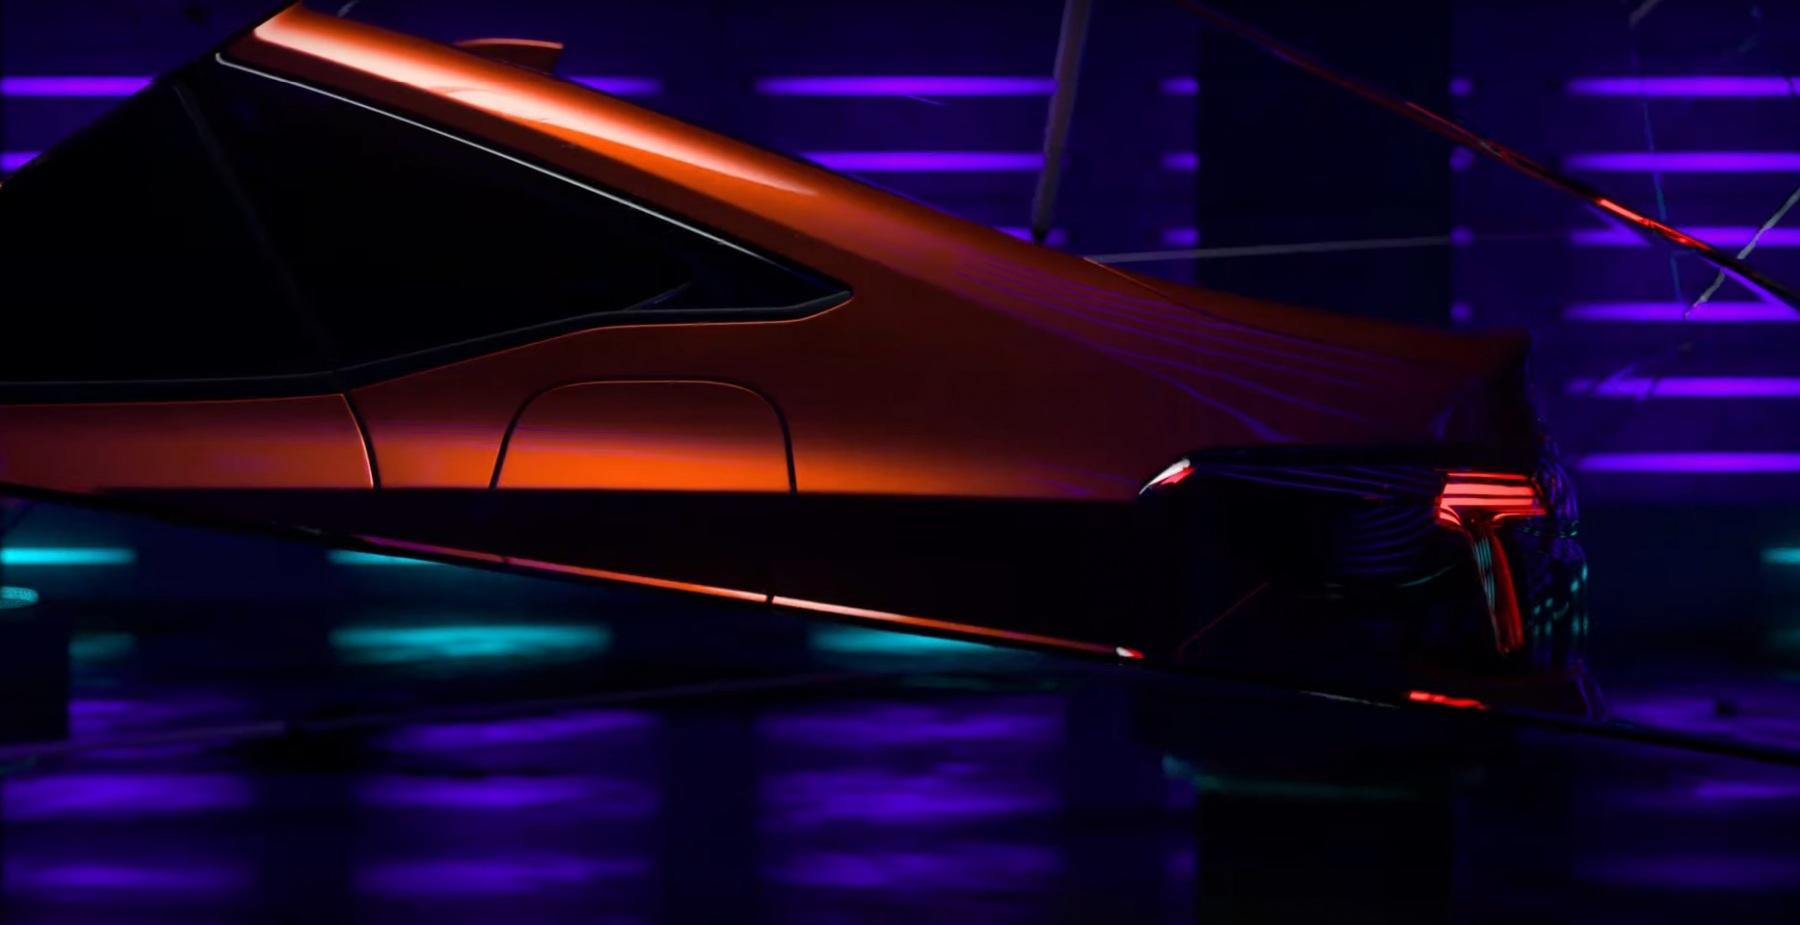 Honda Civic 2022 - Prototipo - Teaser